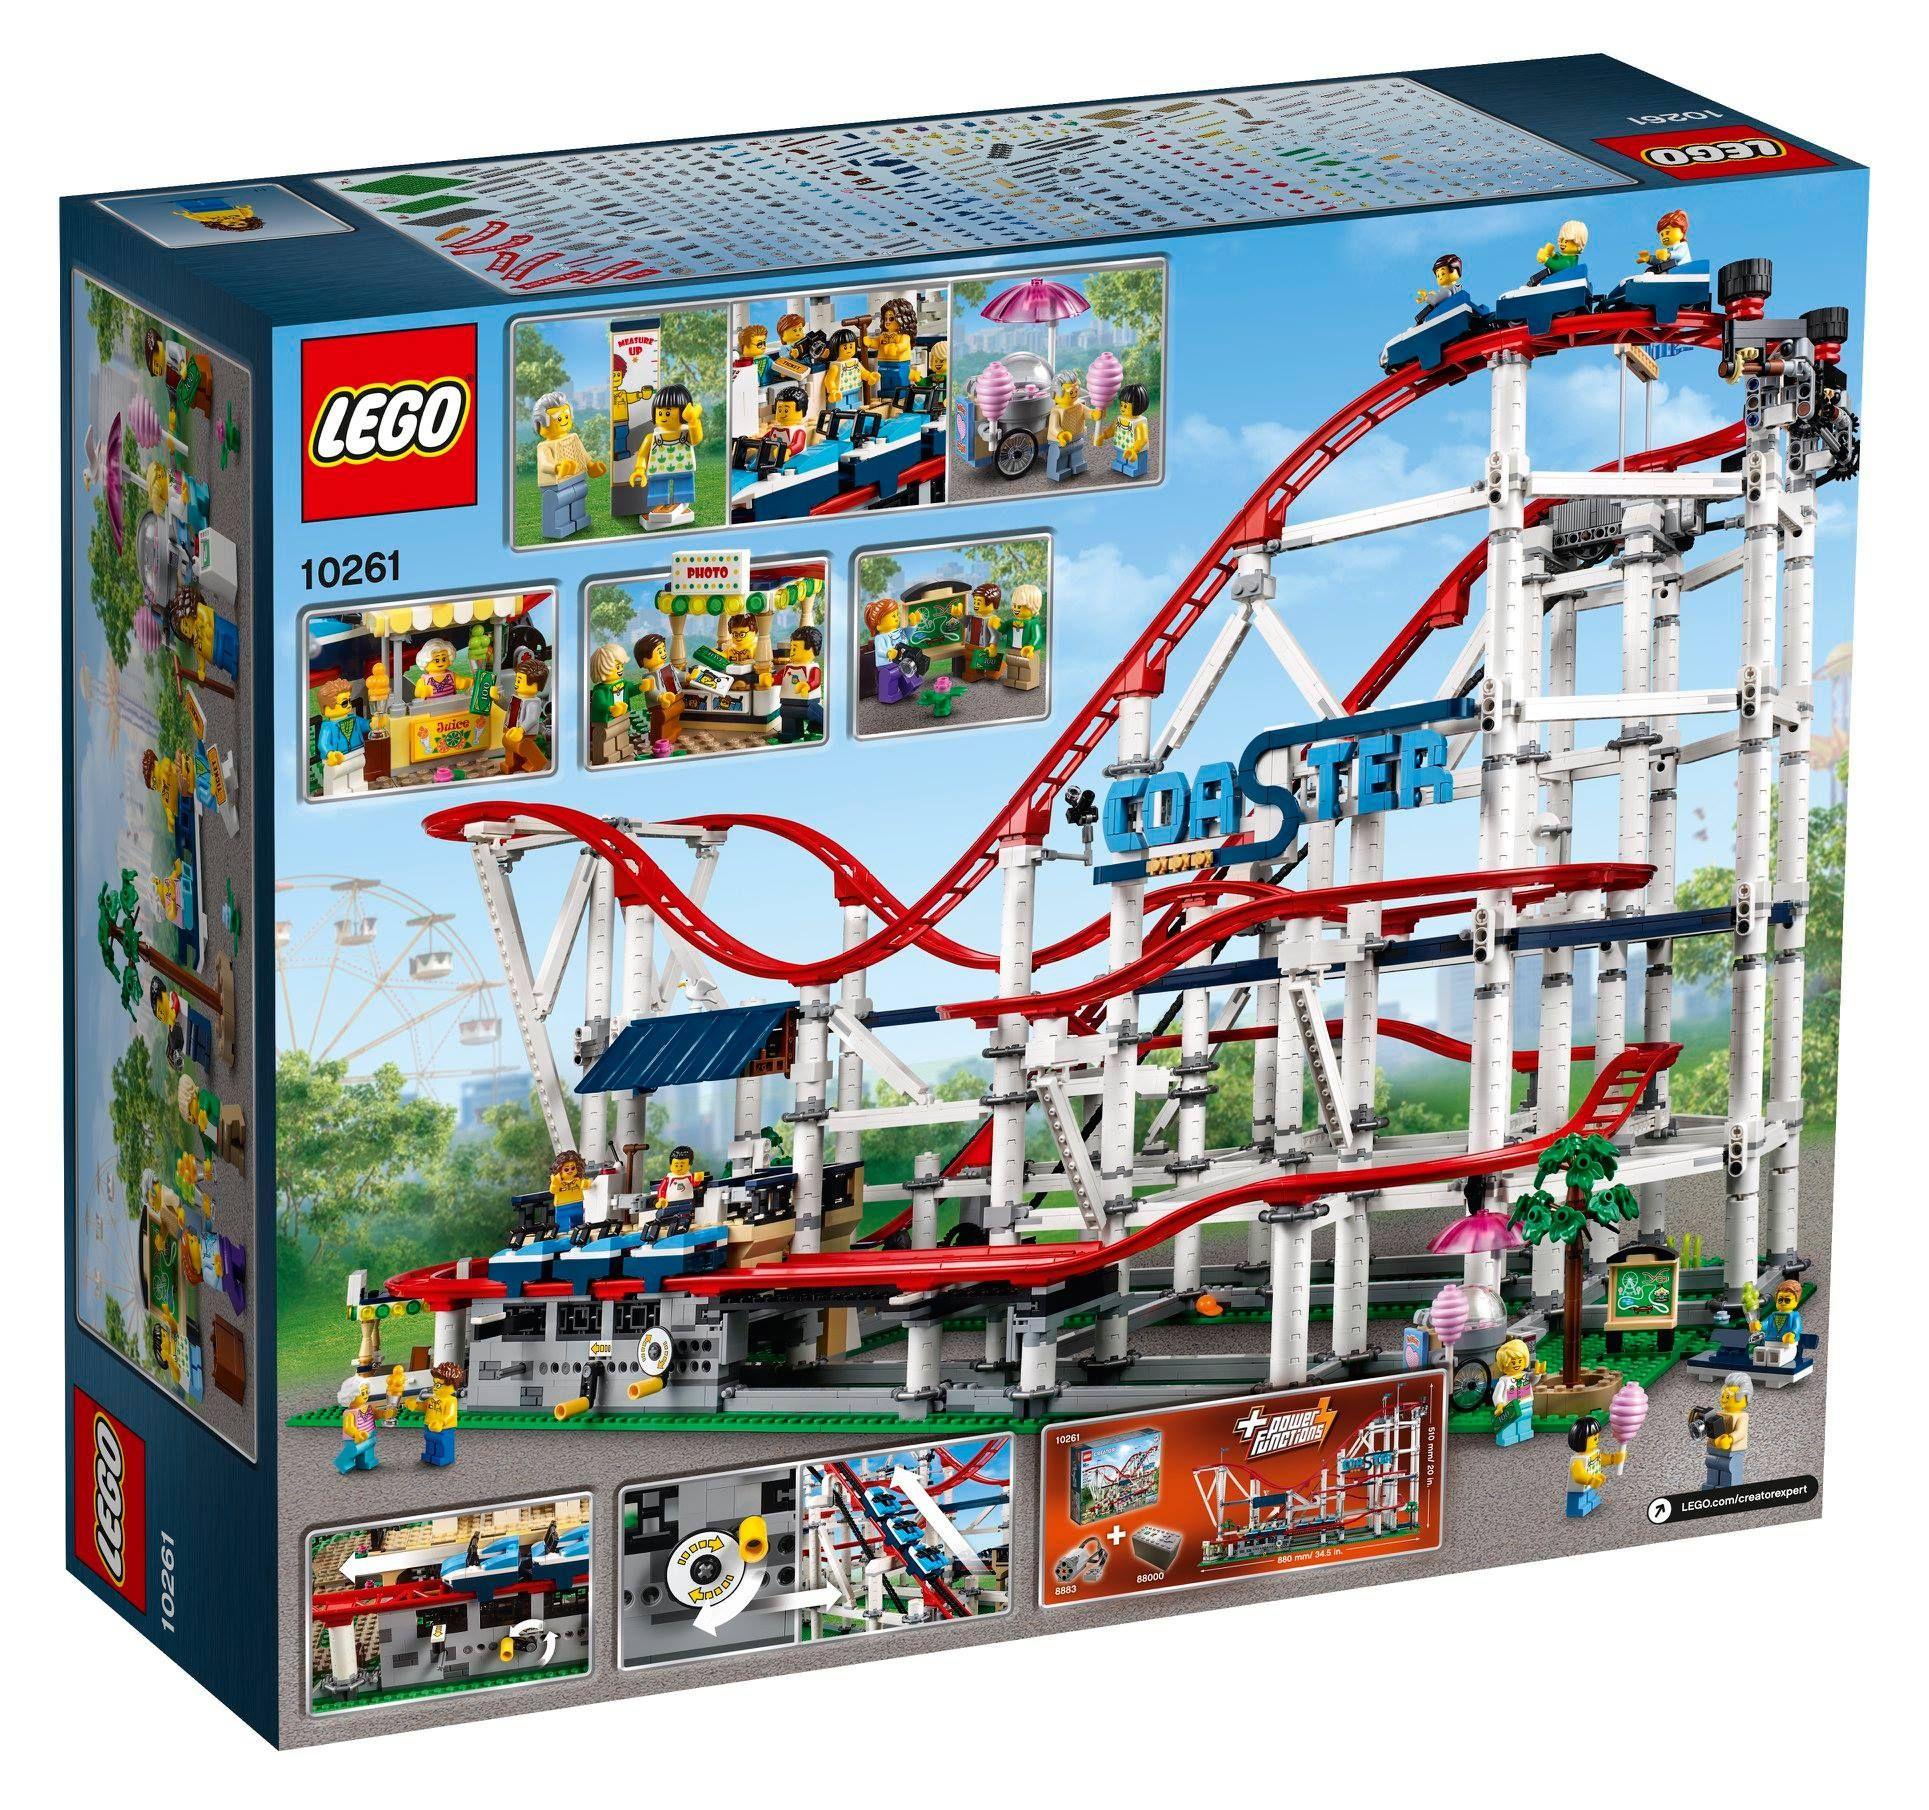 LEGO® Creator Expert Achterbahn (10261) - Bild 03 | ©LEGO Gruppe